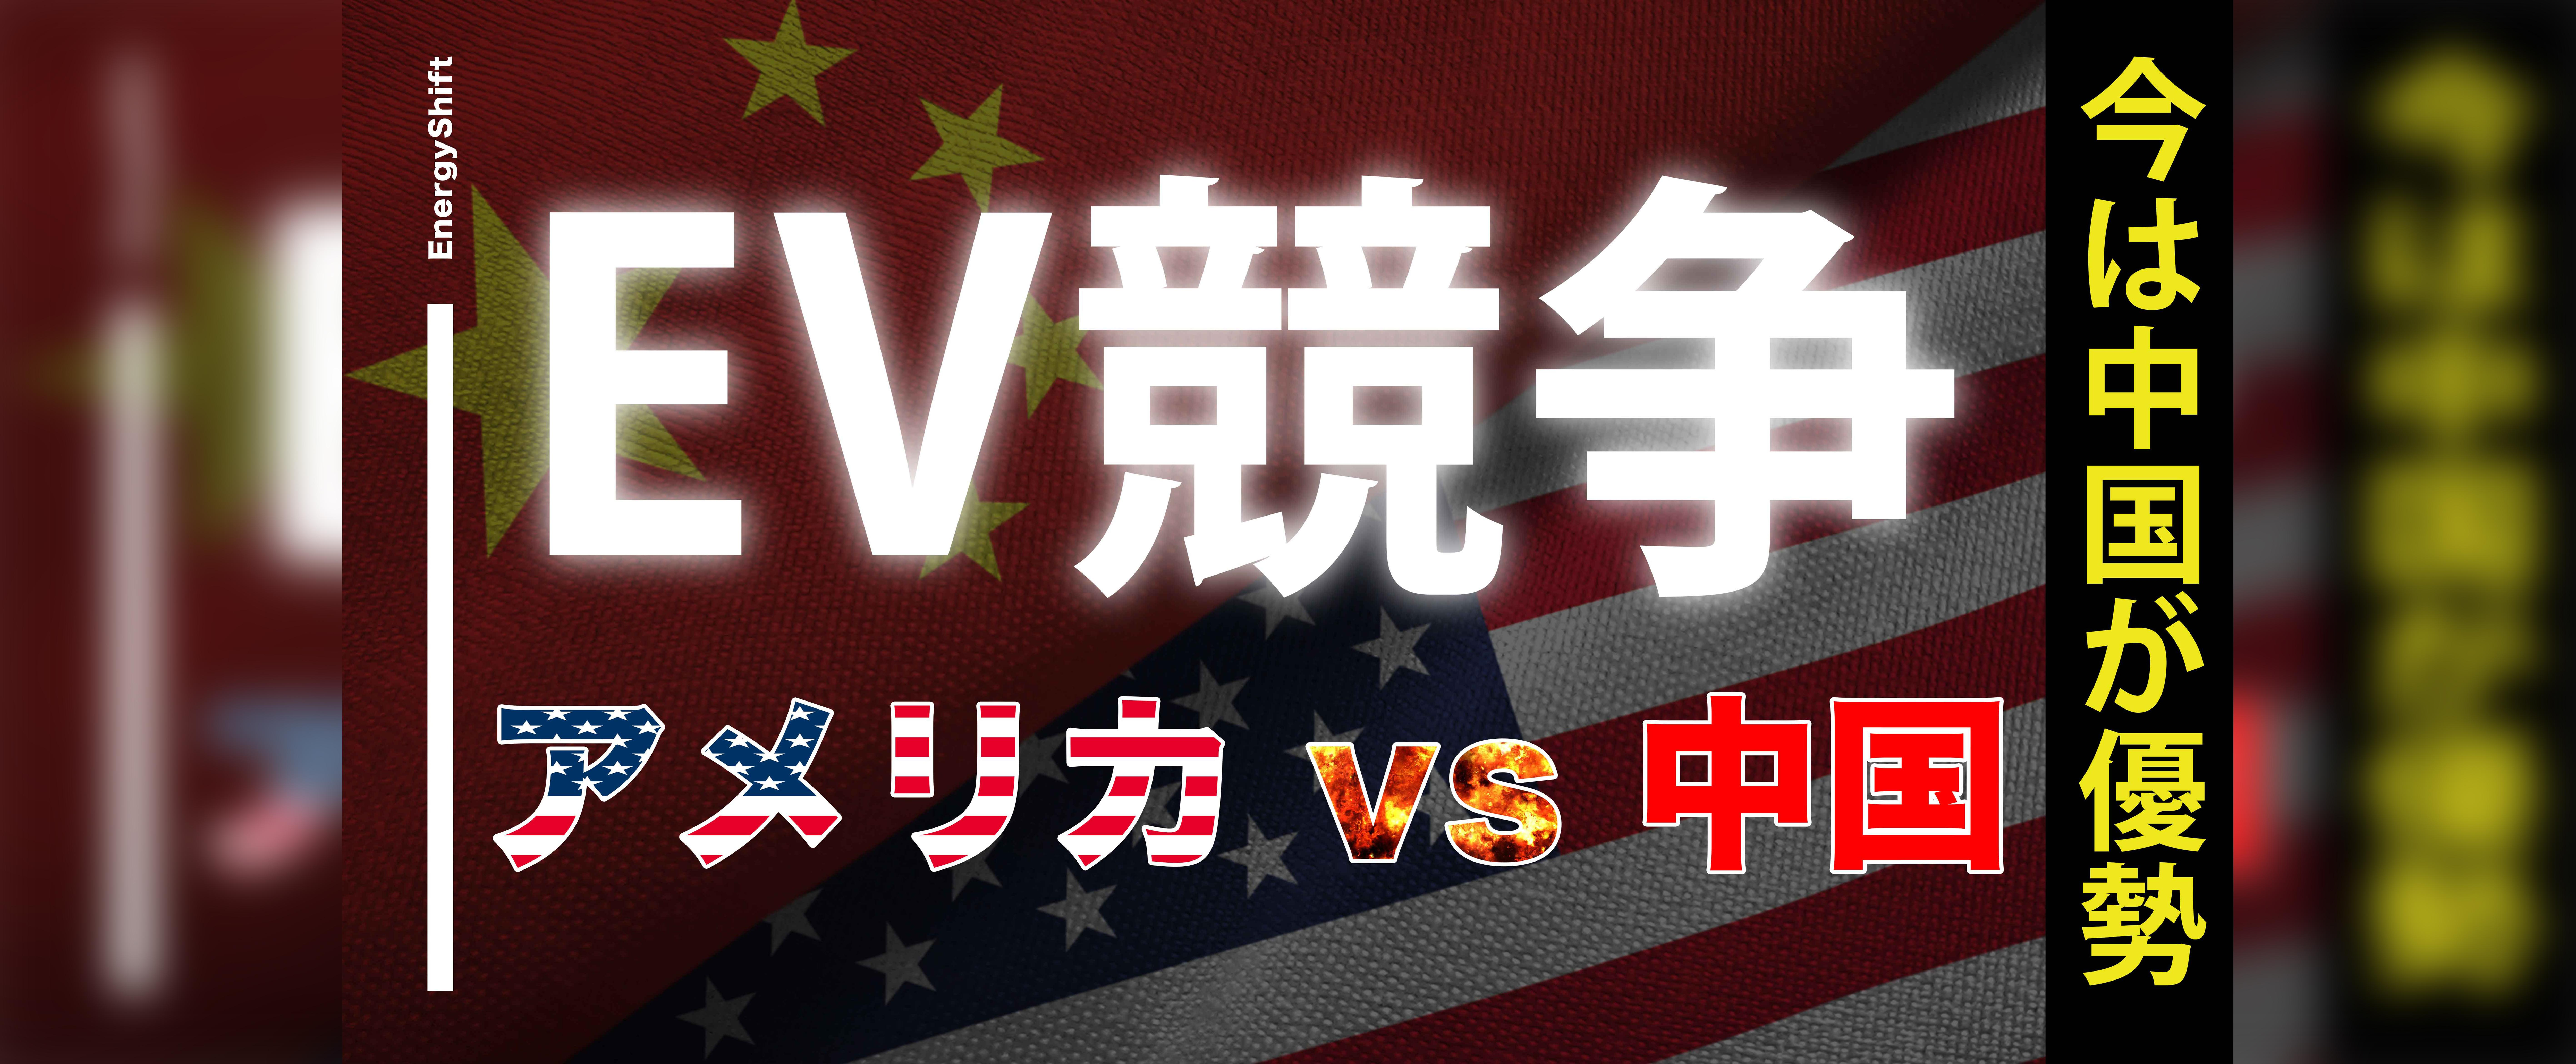 【YouTube】EV関連予算の重要性訴え 「中国に出遅れ」